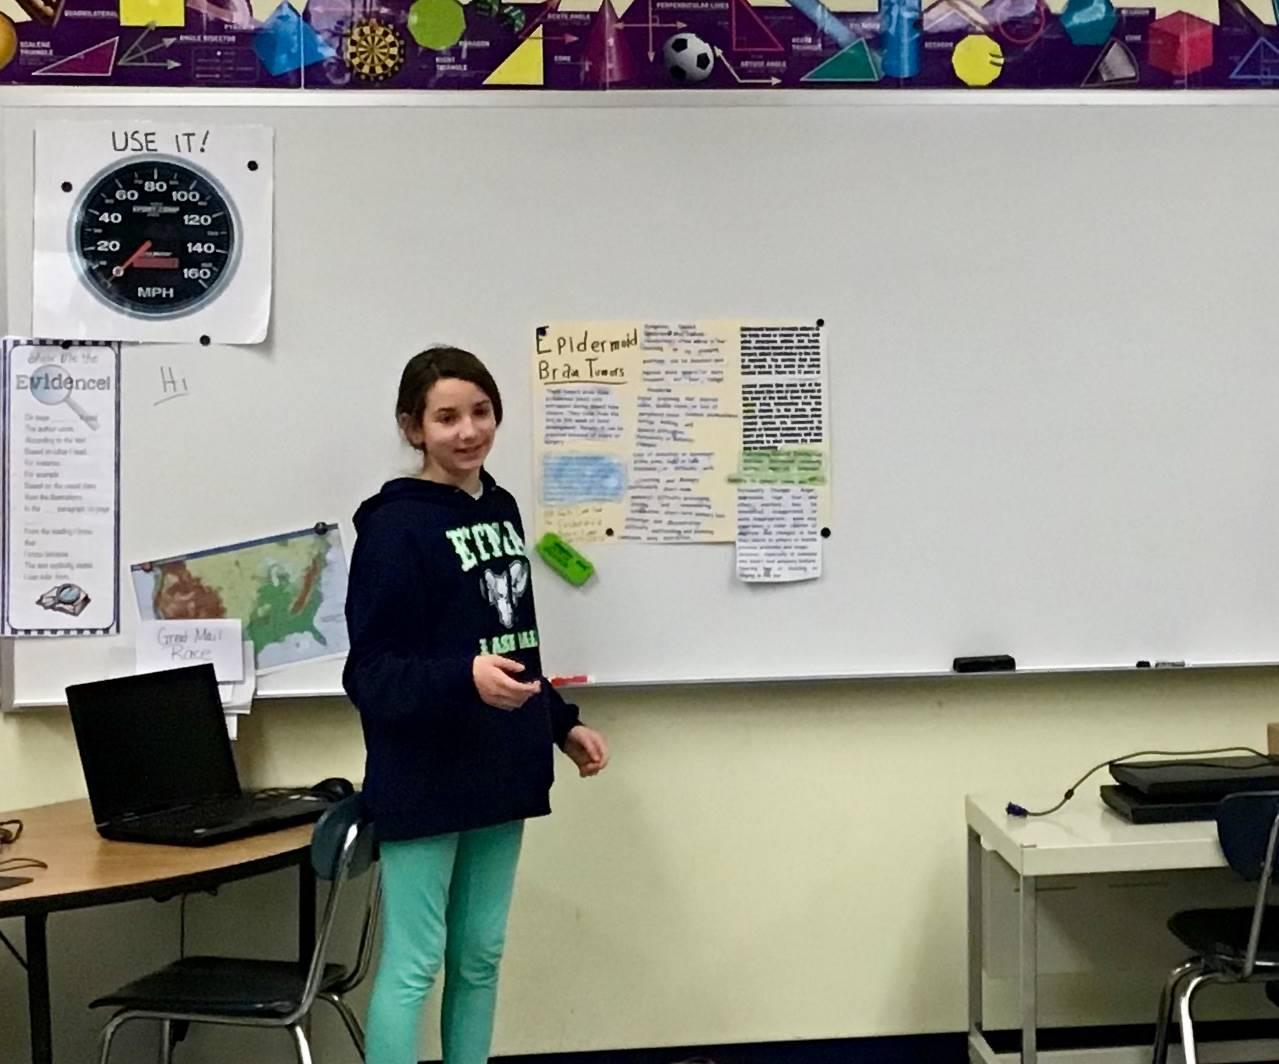 6th grader presenting